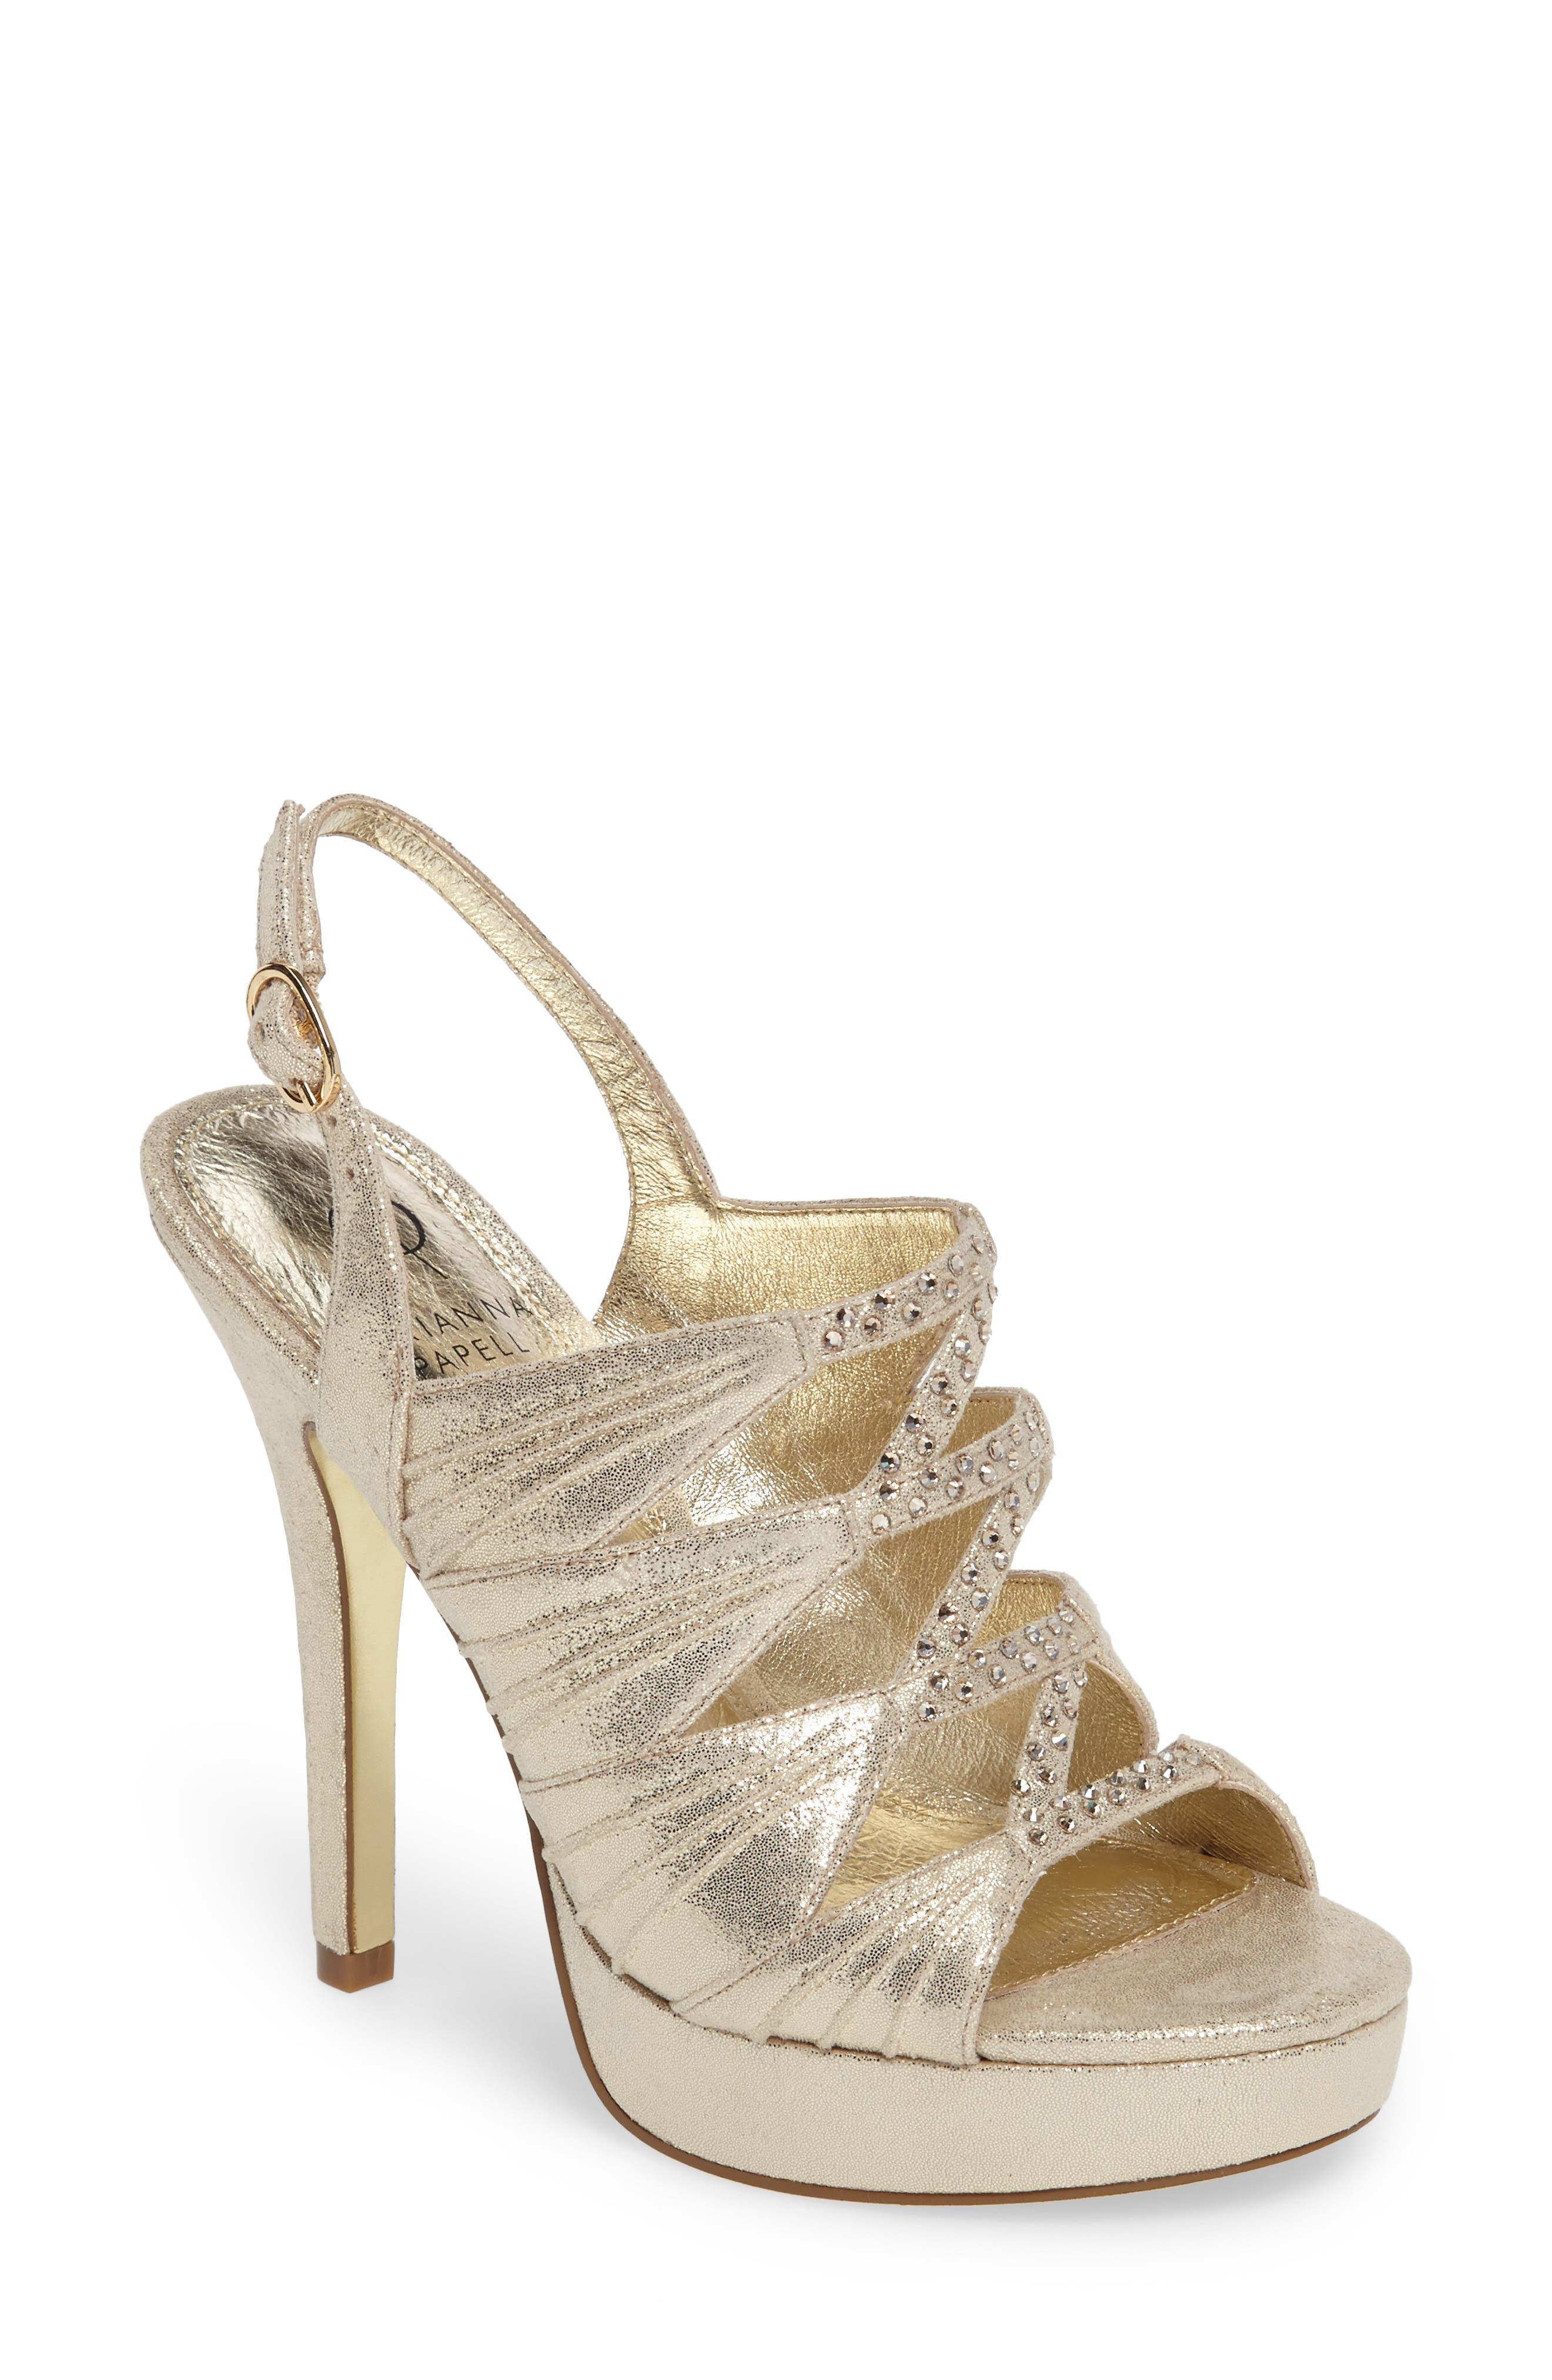 Main Image - Adrianna Pappell Marissa Platform Sandal (Women)